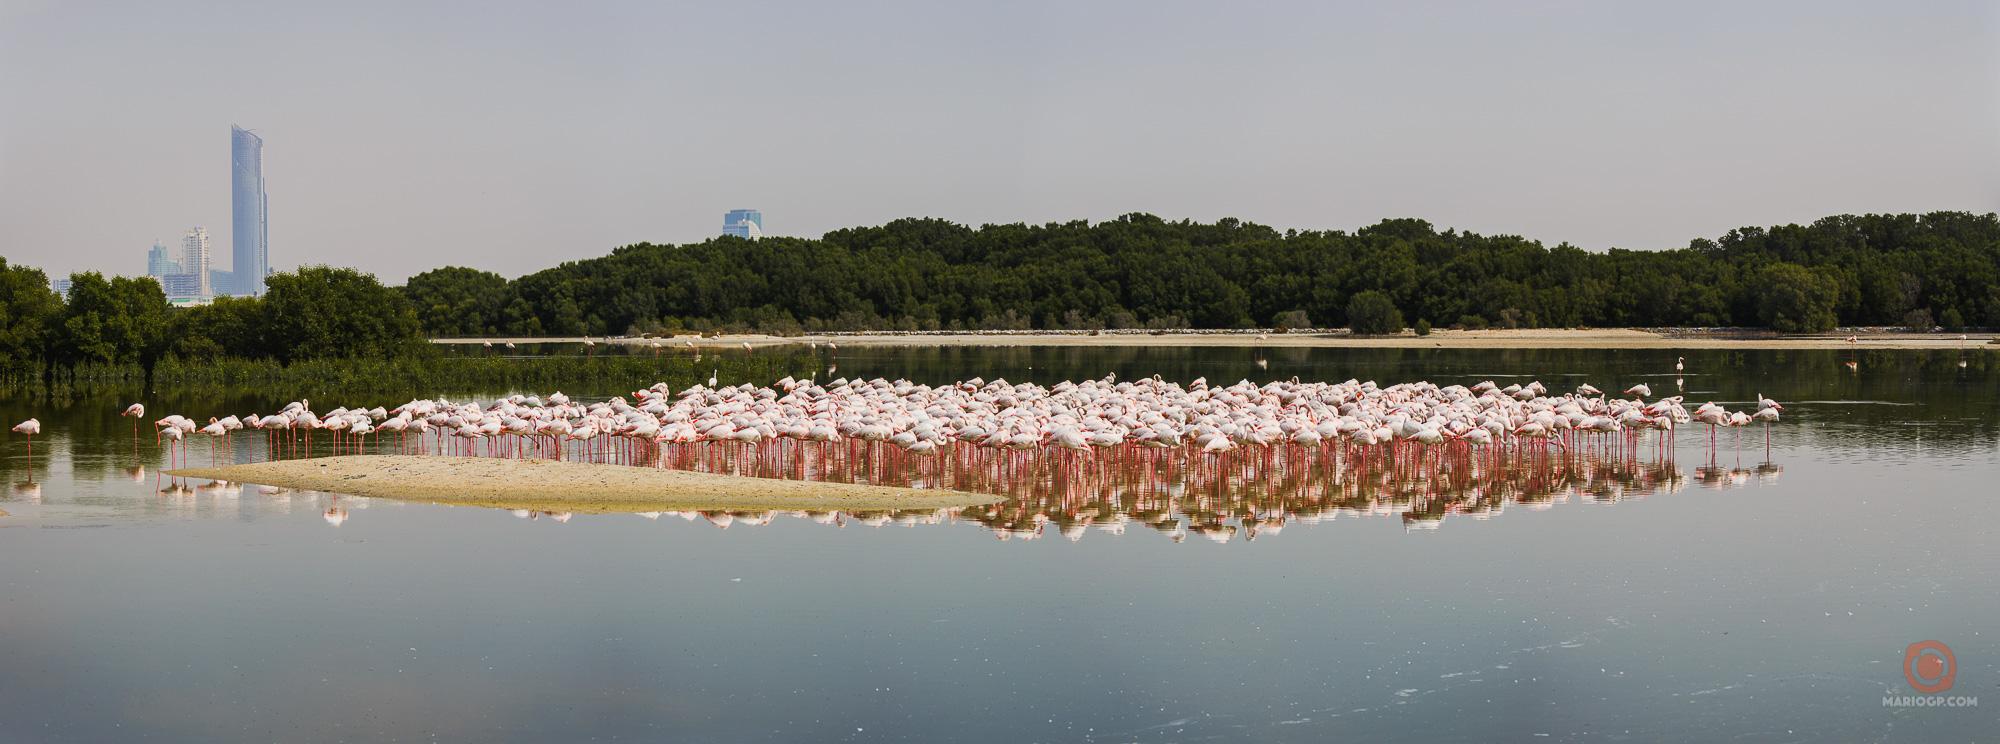 Ras al Khor Wildlife Sanctuary in Dubai.